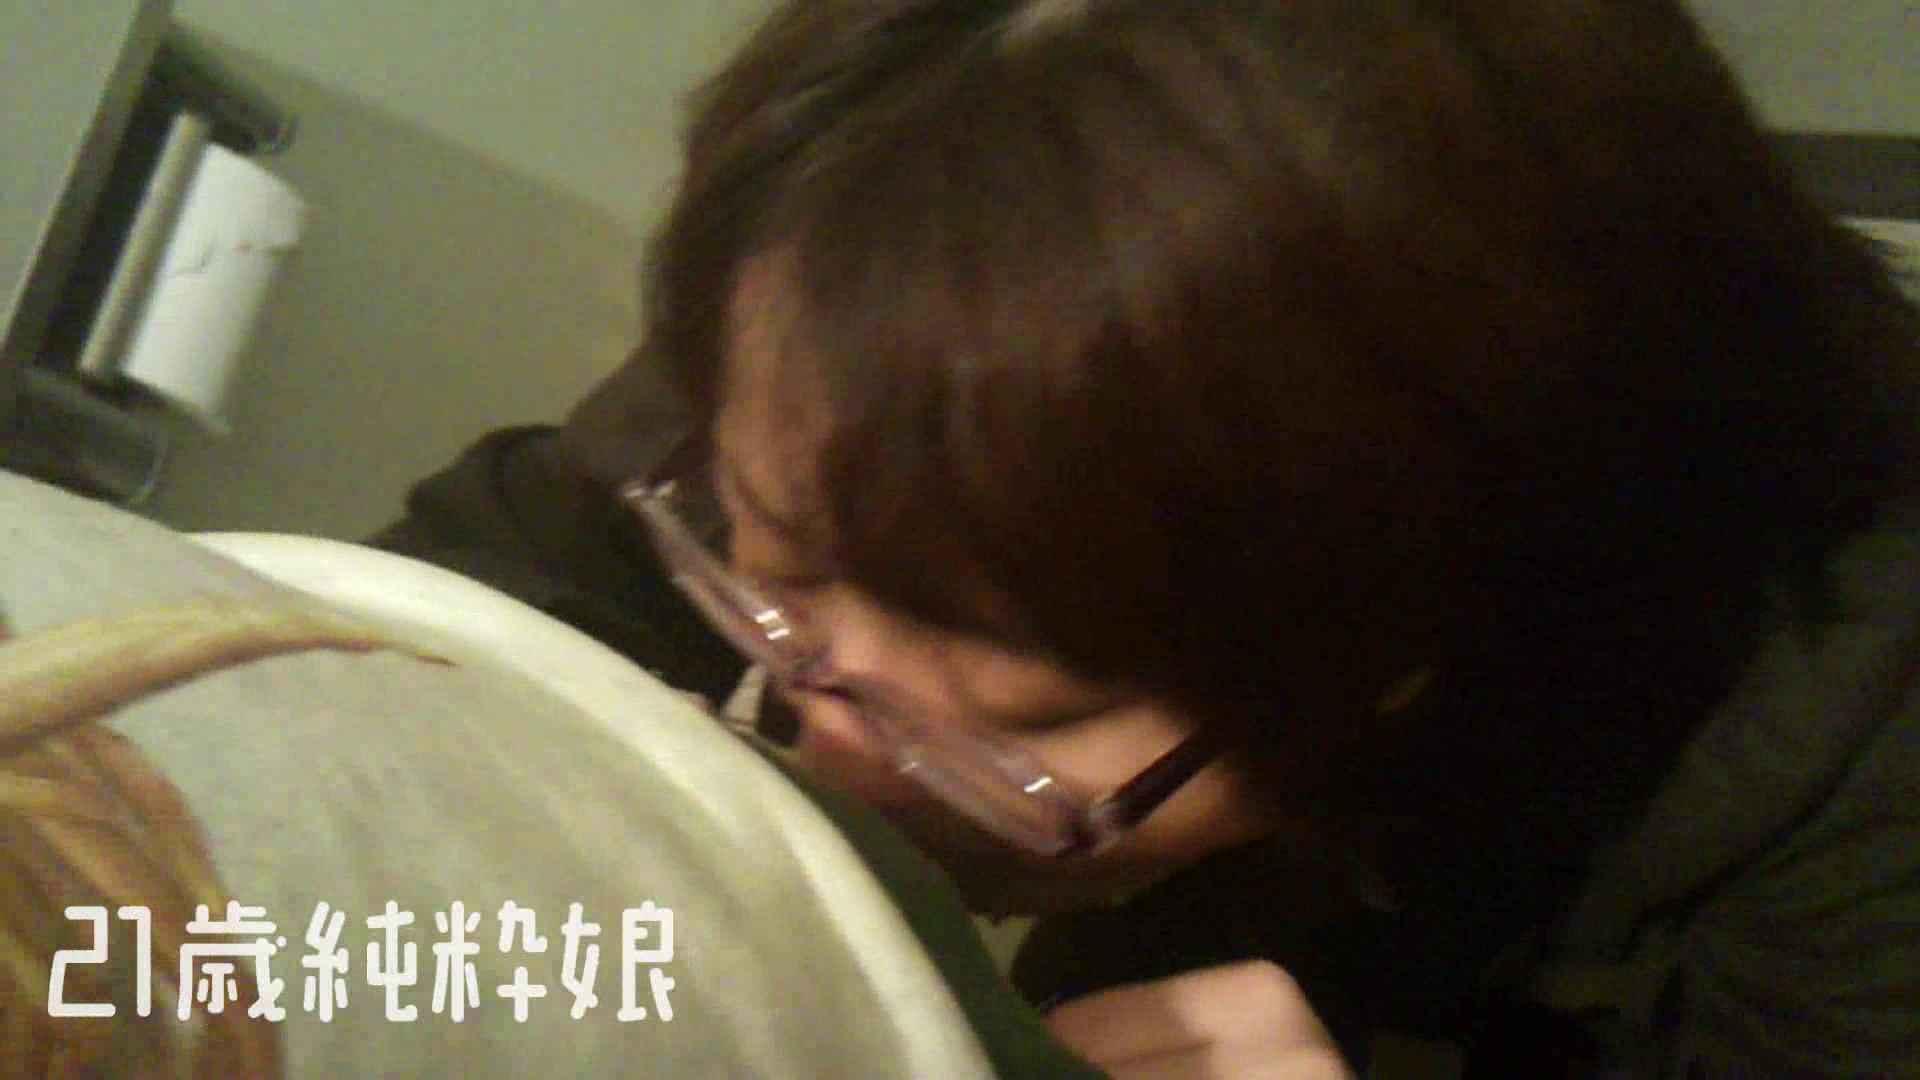 Gカップ21歳純粋嬢第2弾Vol.5 一般投稿 | エッチなOL  77pic 31